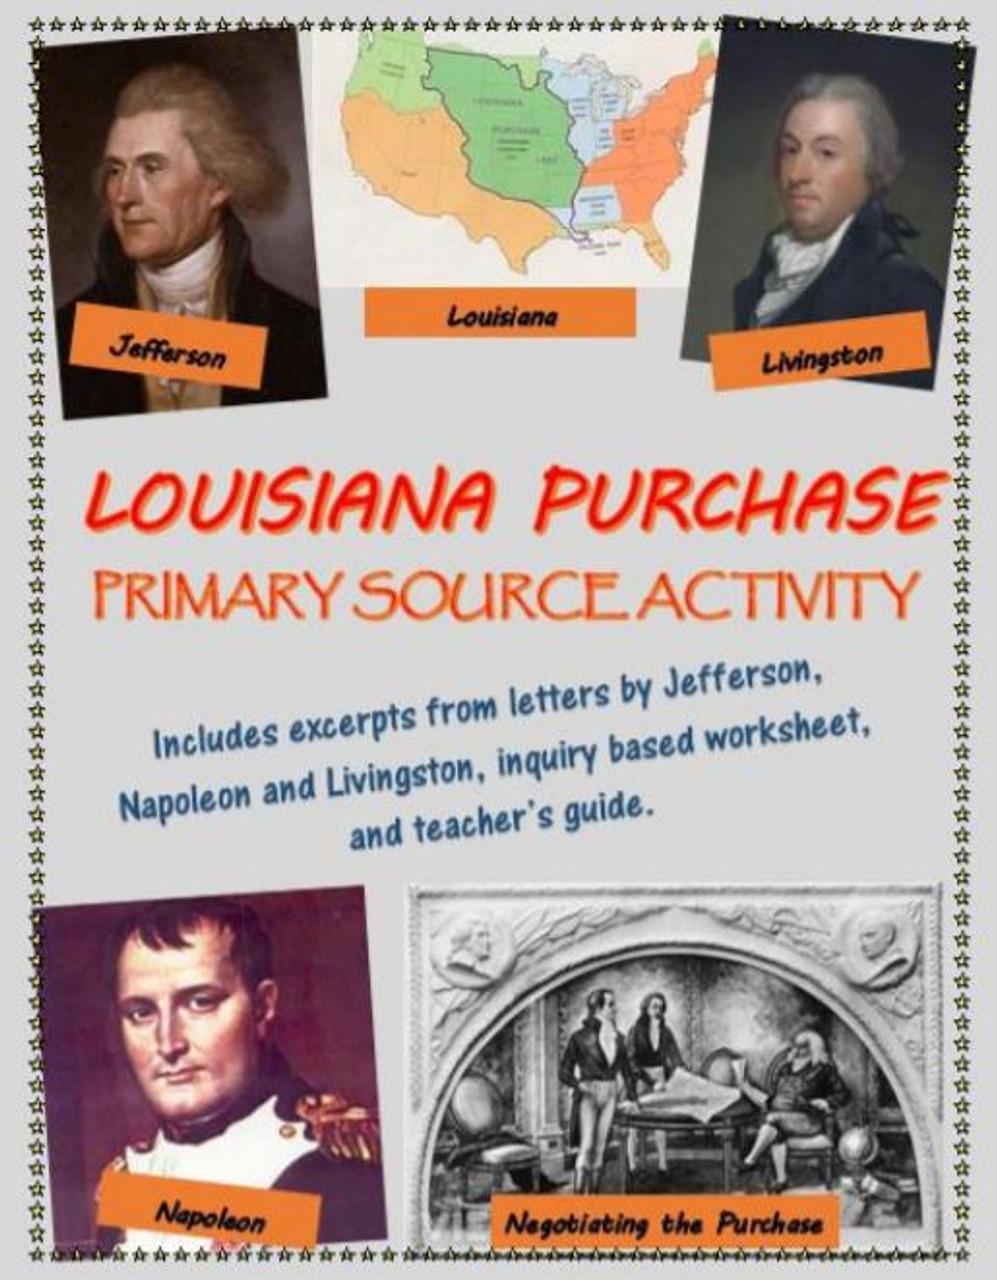 Louisiana Purchase primary source analysis activity